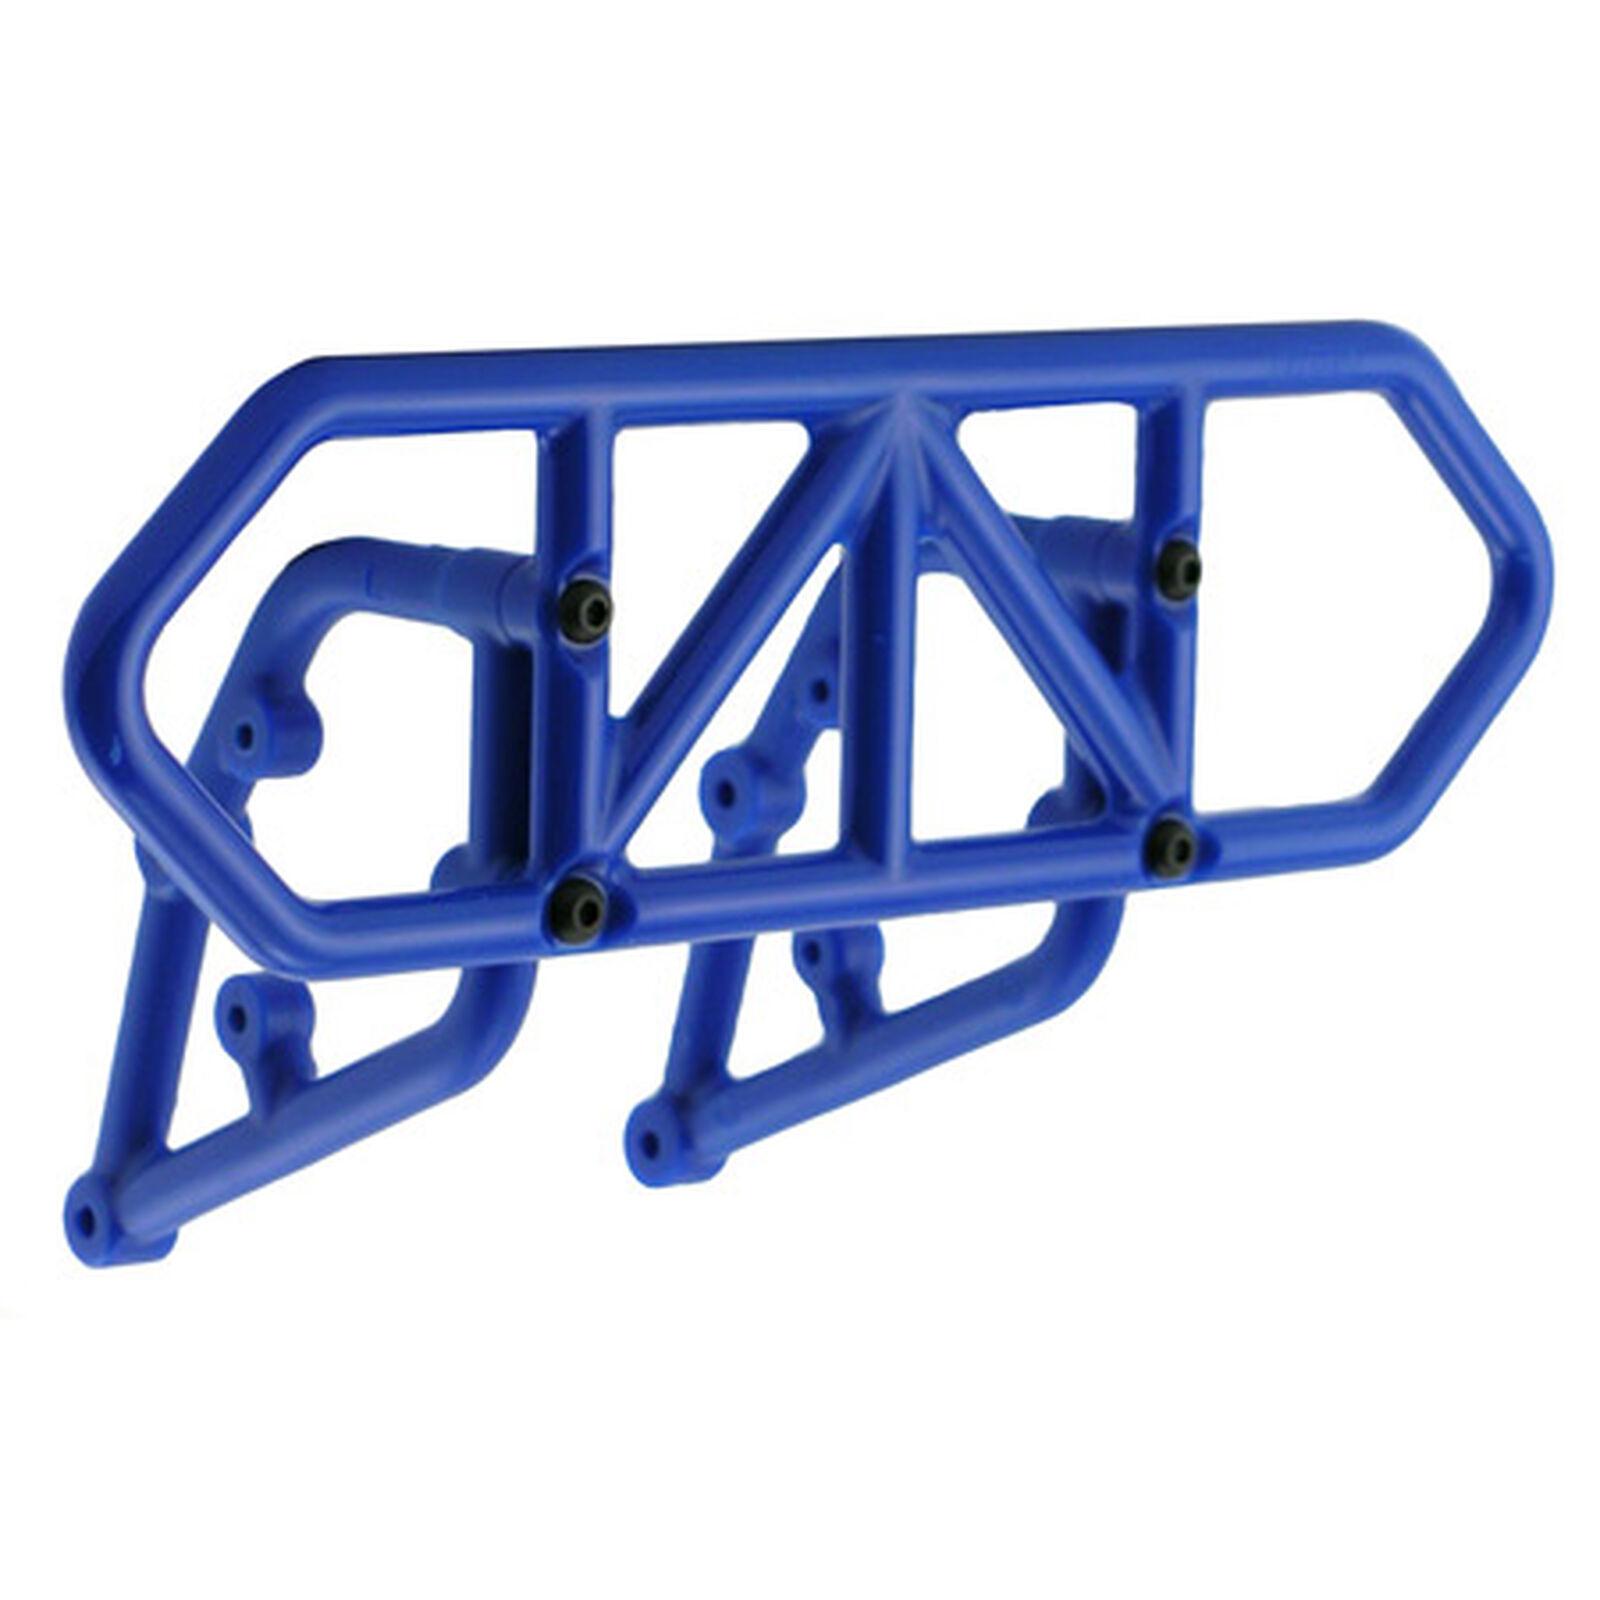 Rear Bumper, Blue: SLH